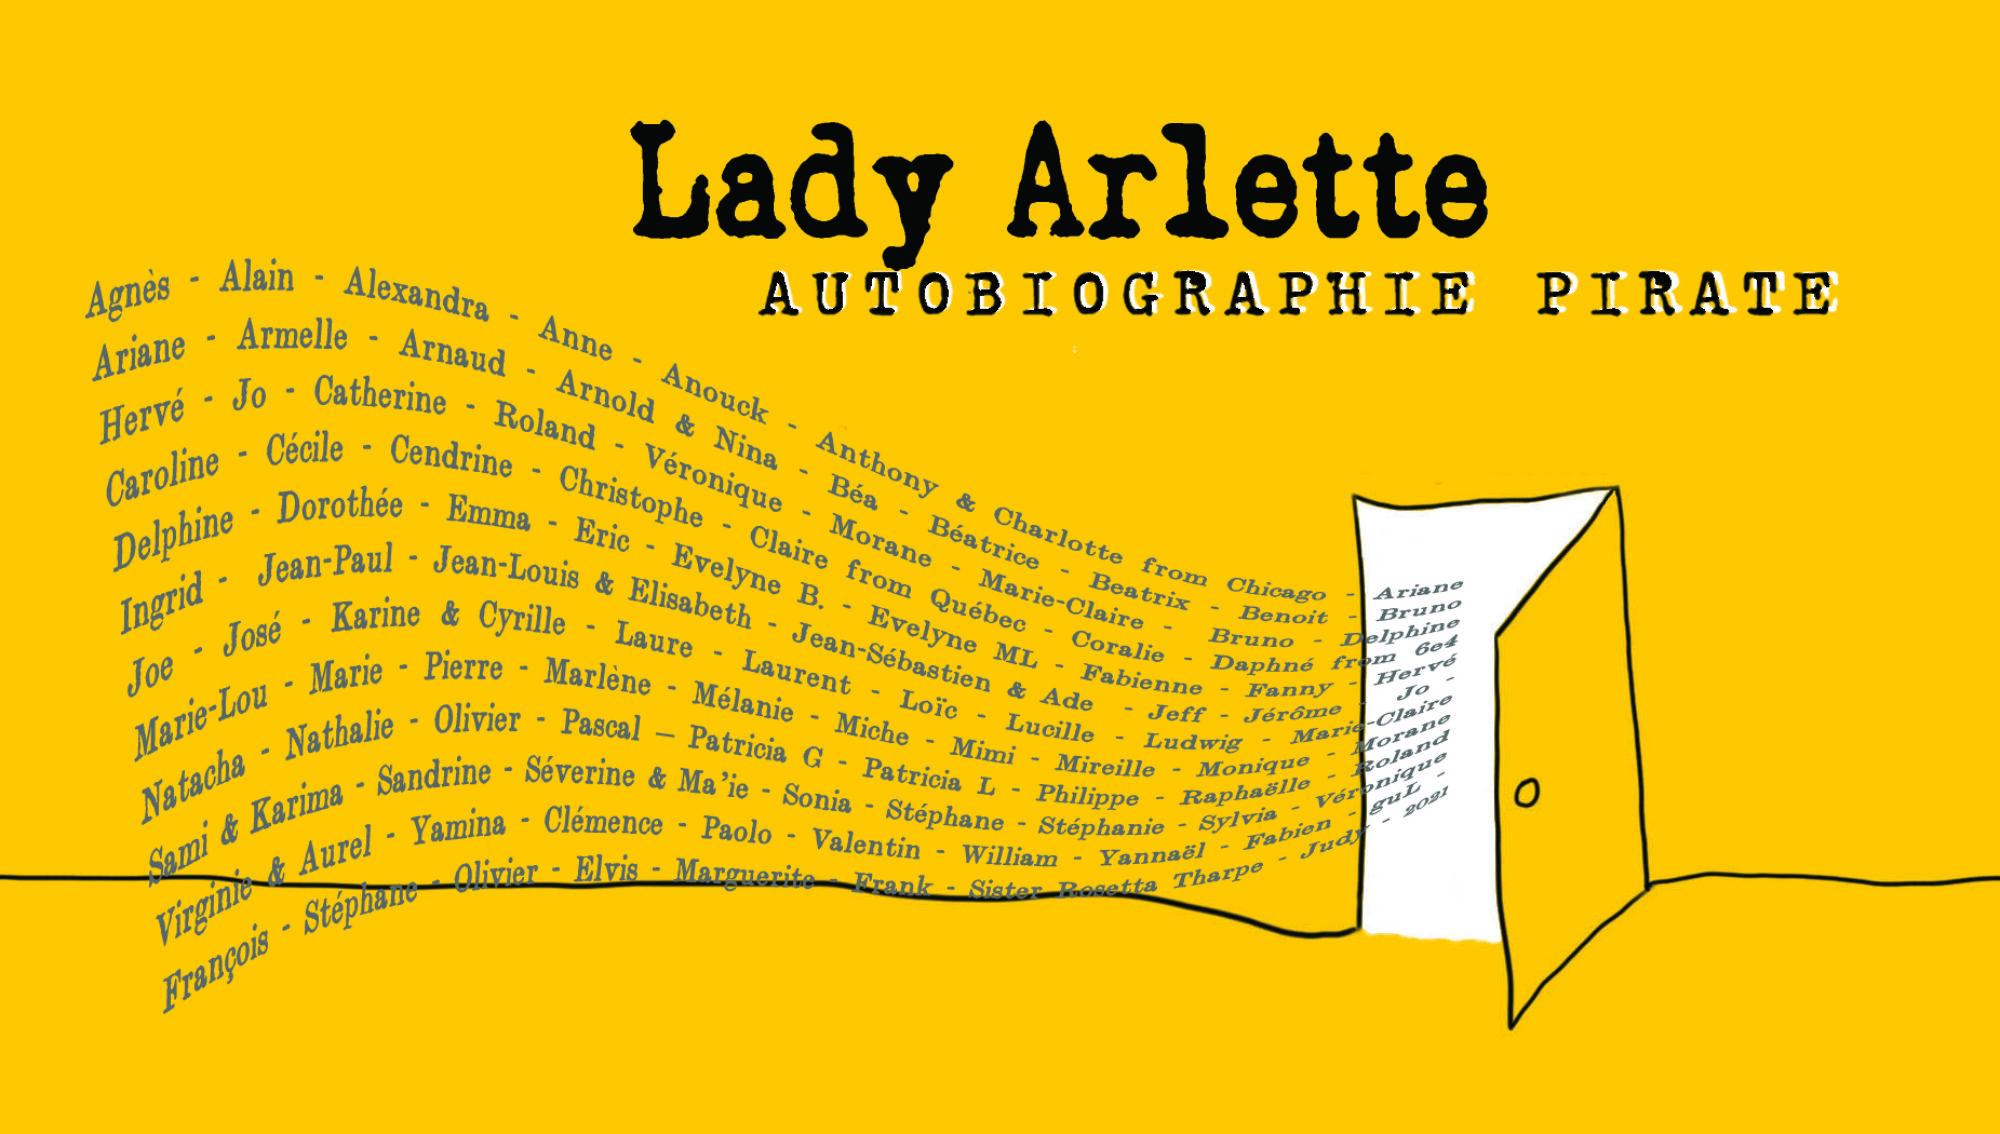 Lady Arlette